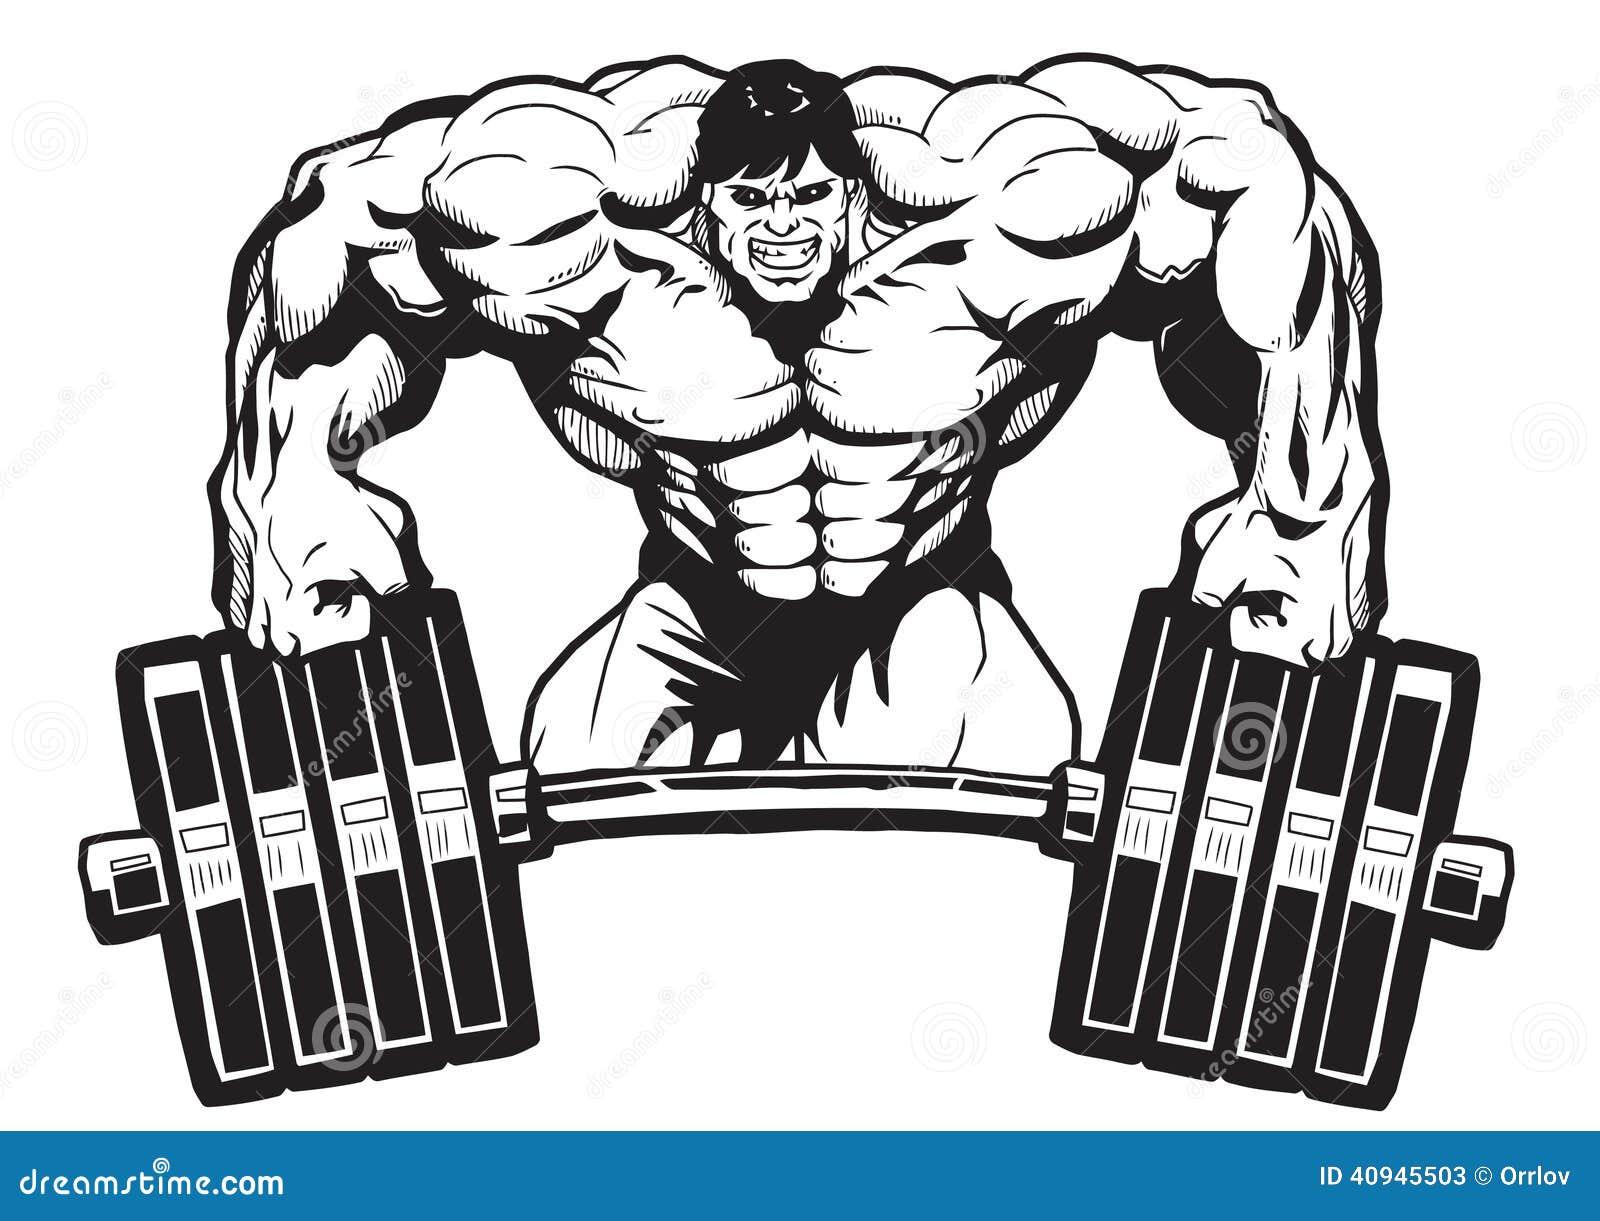 Sports Bar Stock Vector - Image: 40945503